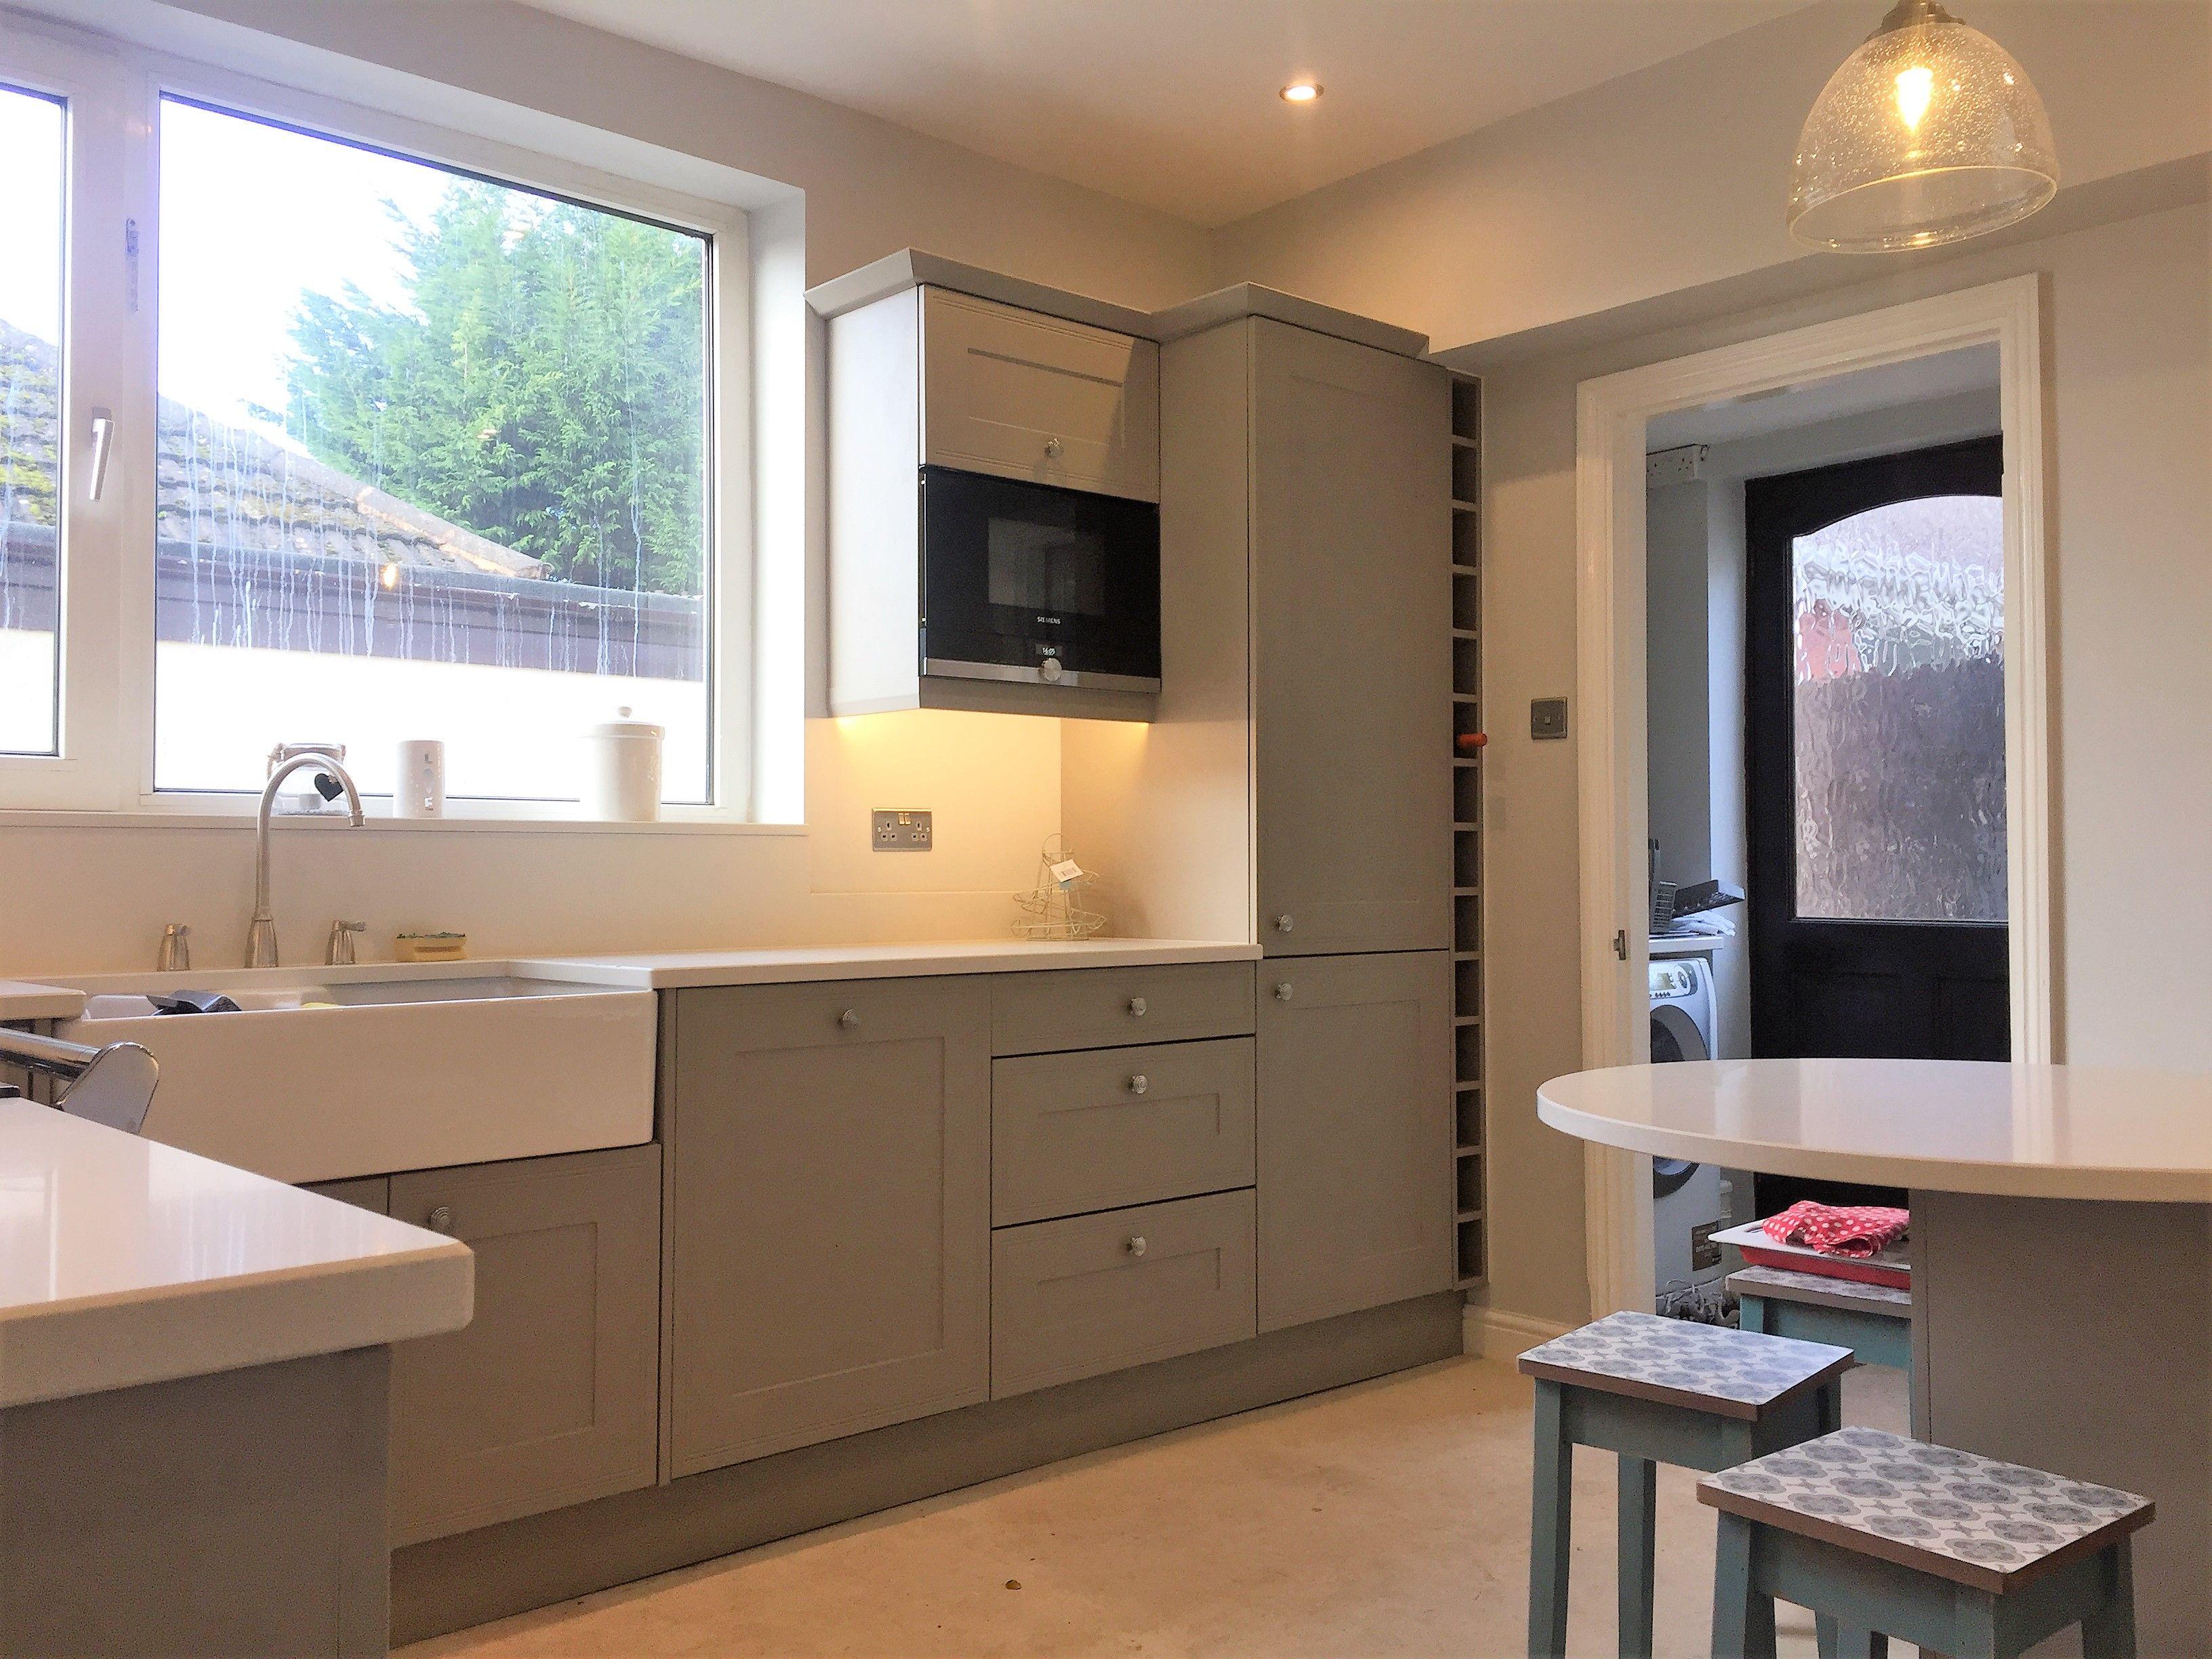 Matt Stone Grey Shaker Style Kitchen | Kitchen Portfolio | Pinterest ...